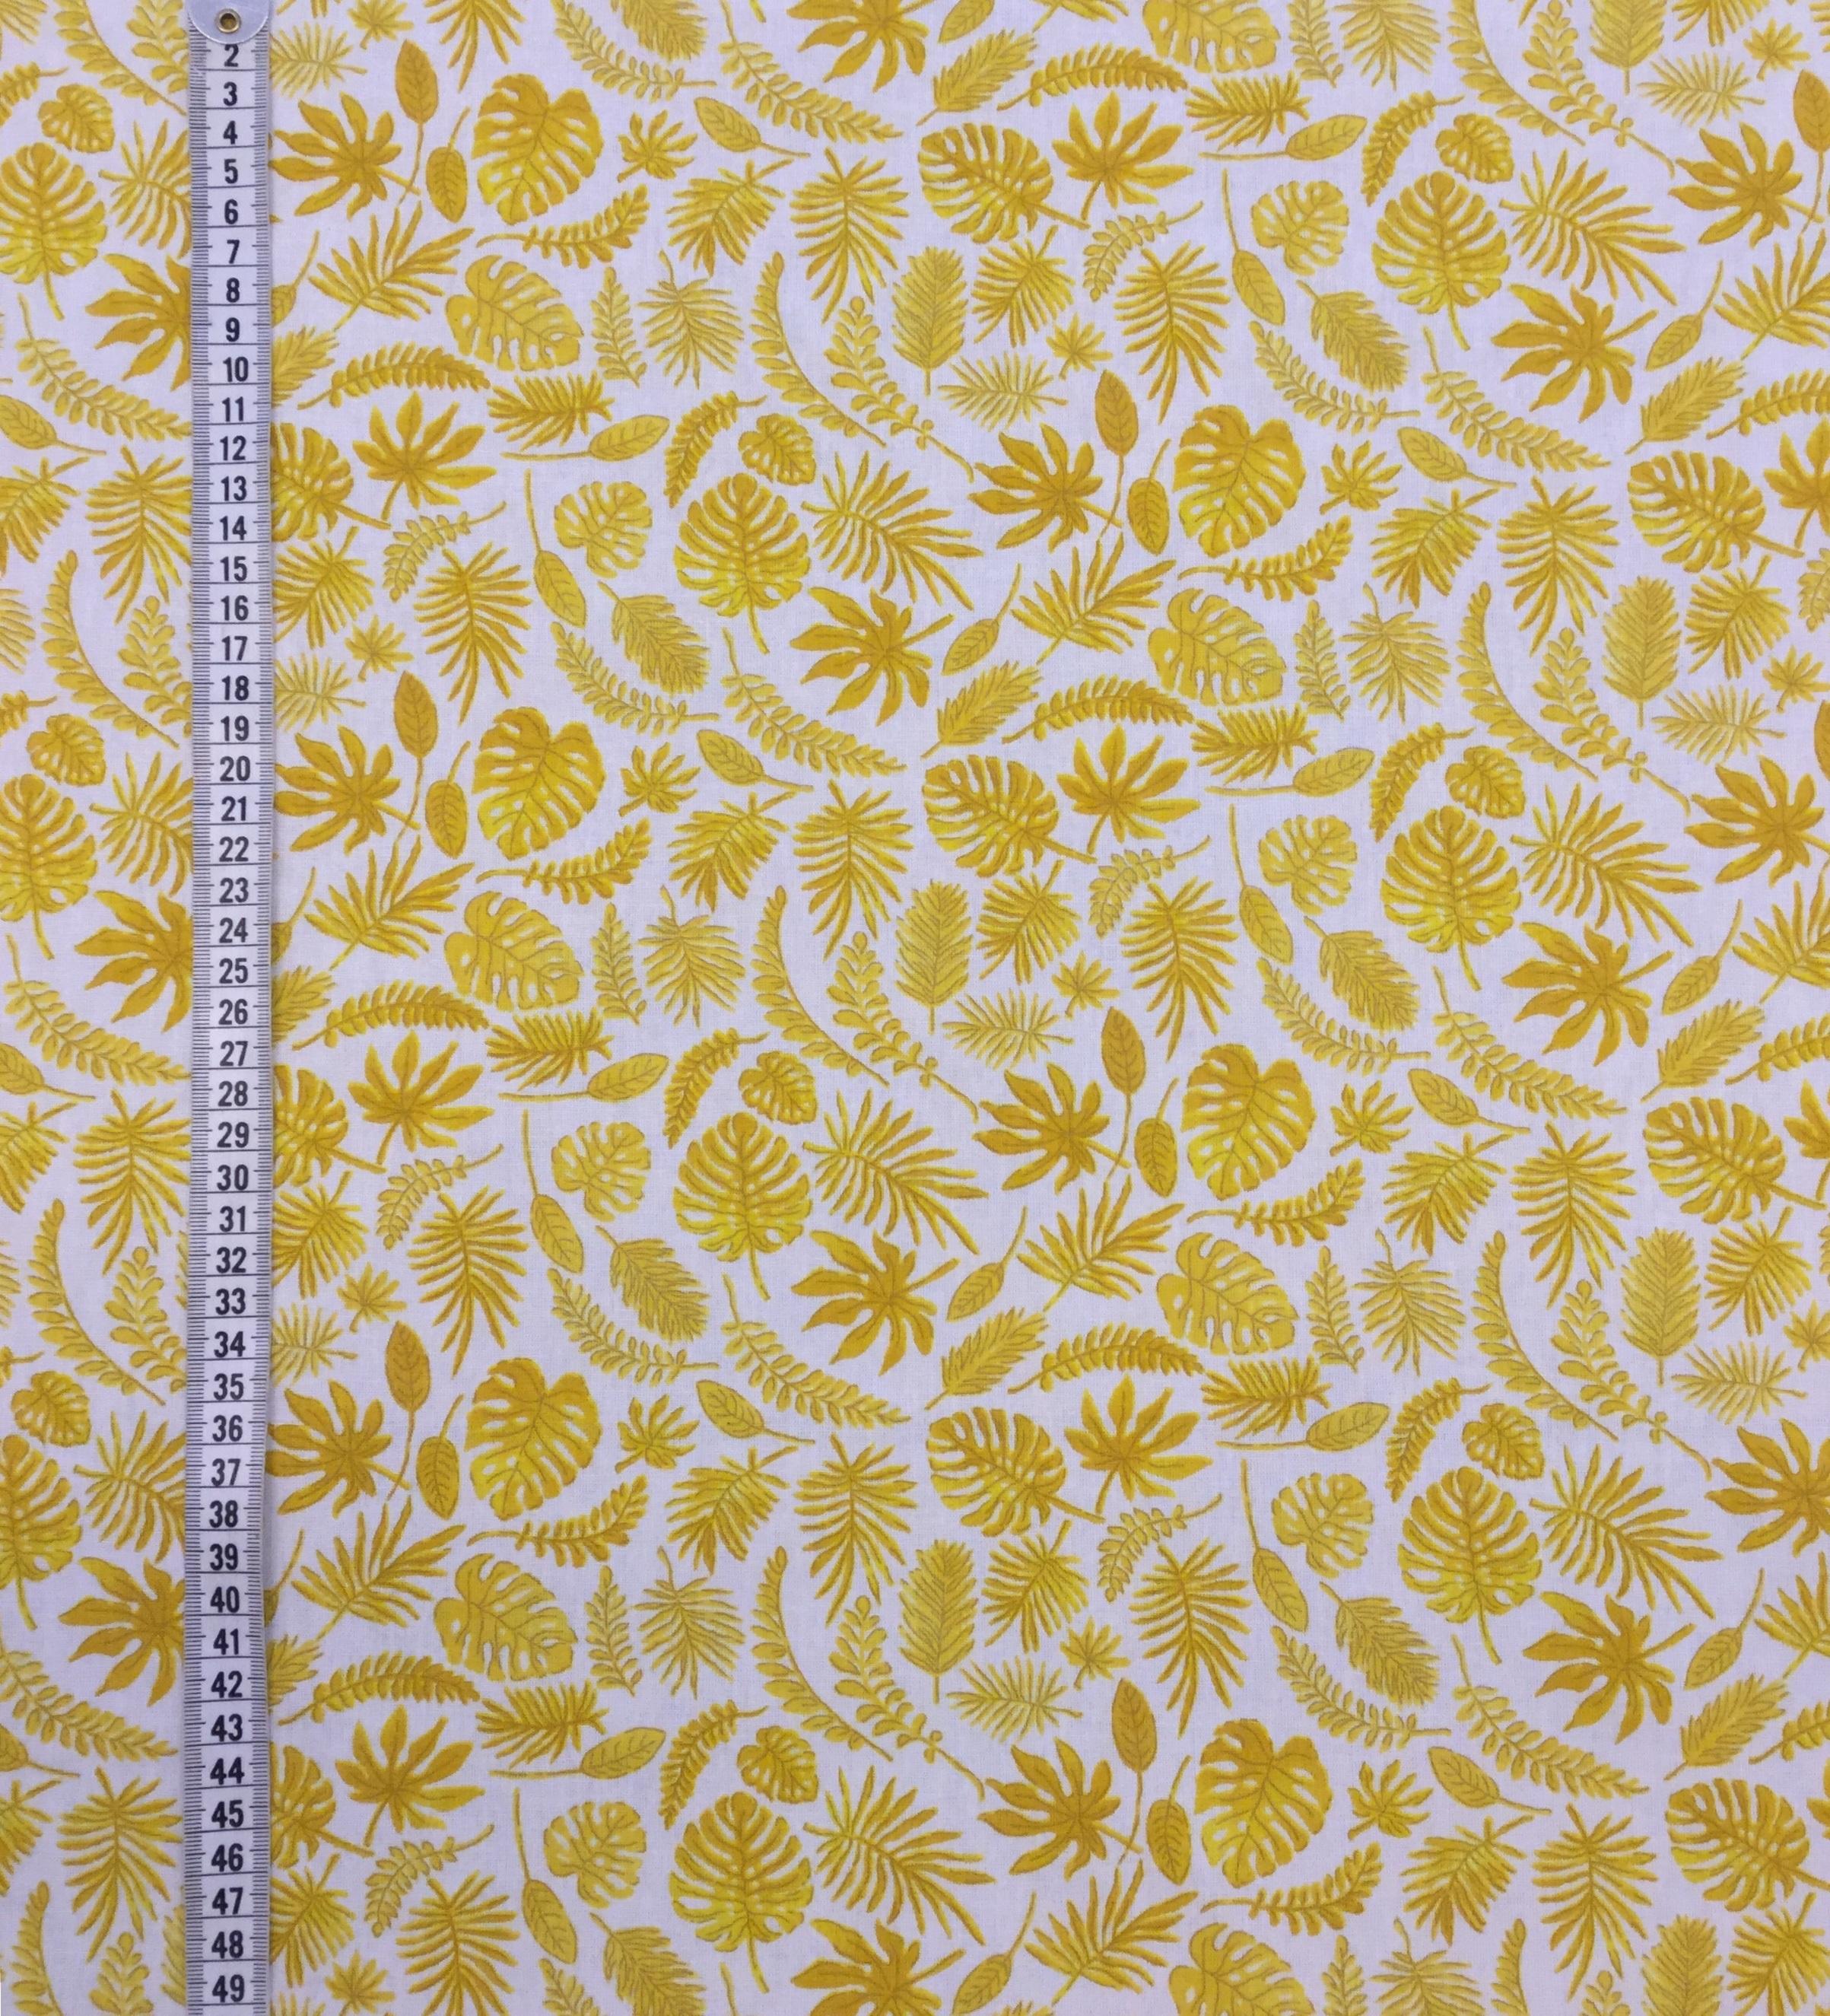 miniblad gul metervara bomull vävt tyg Tyglust gul